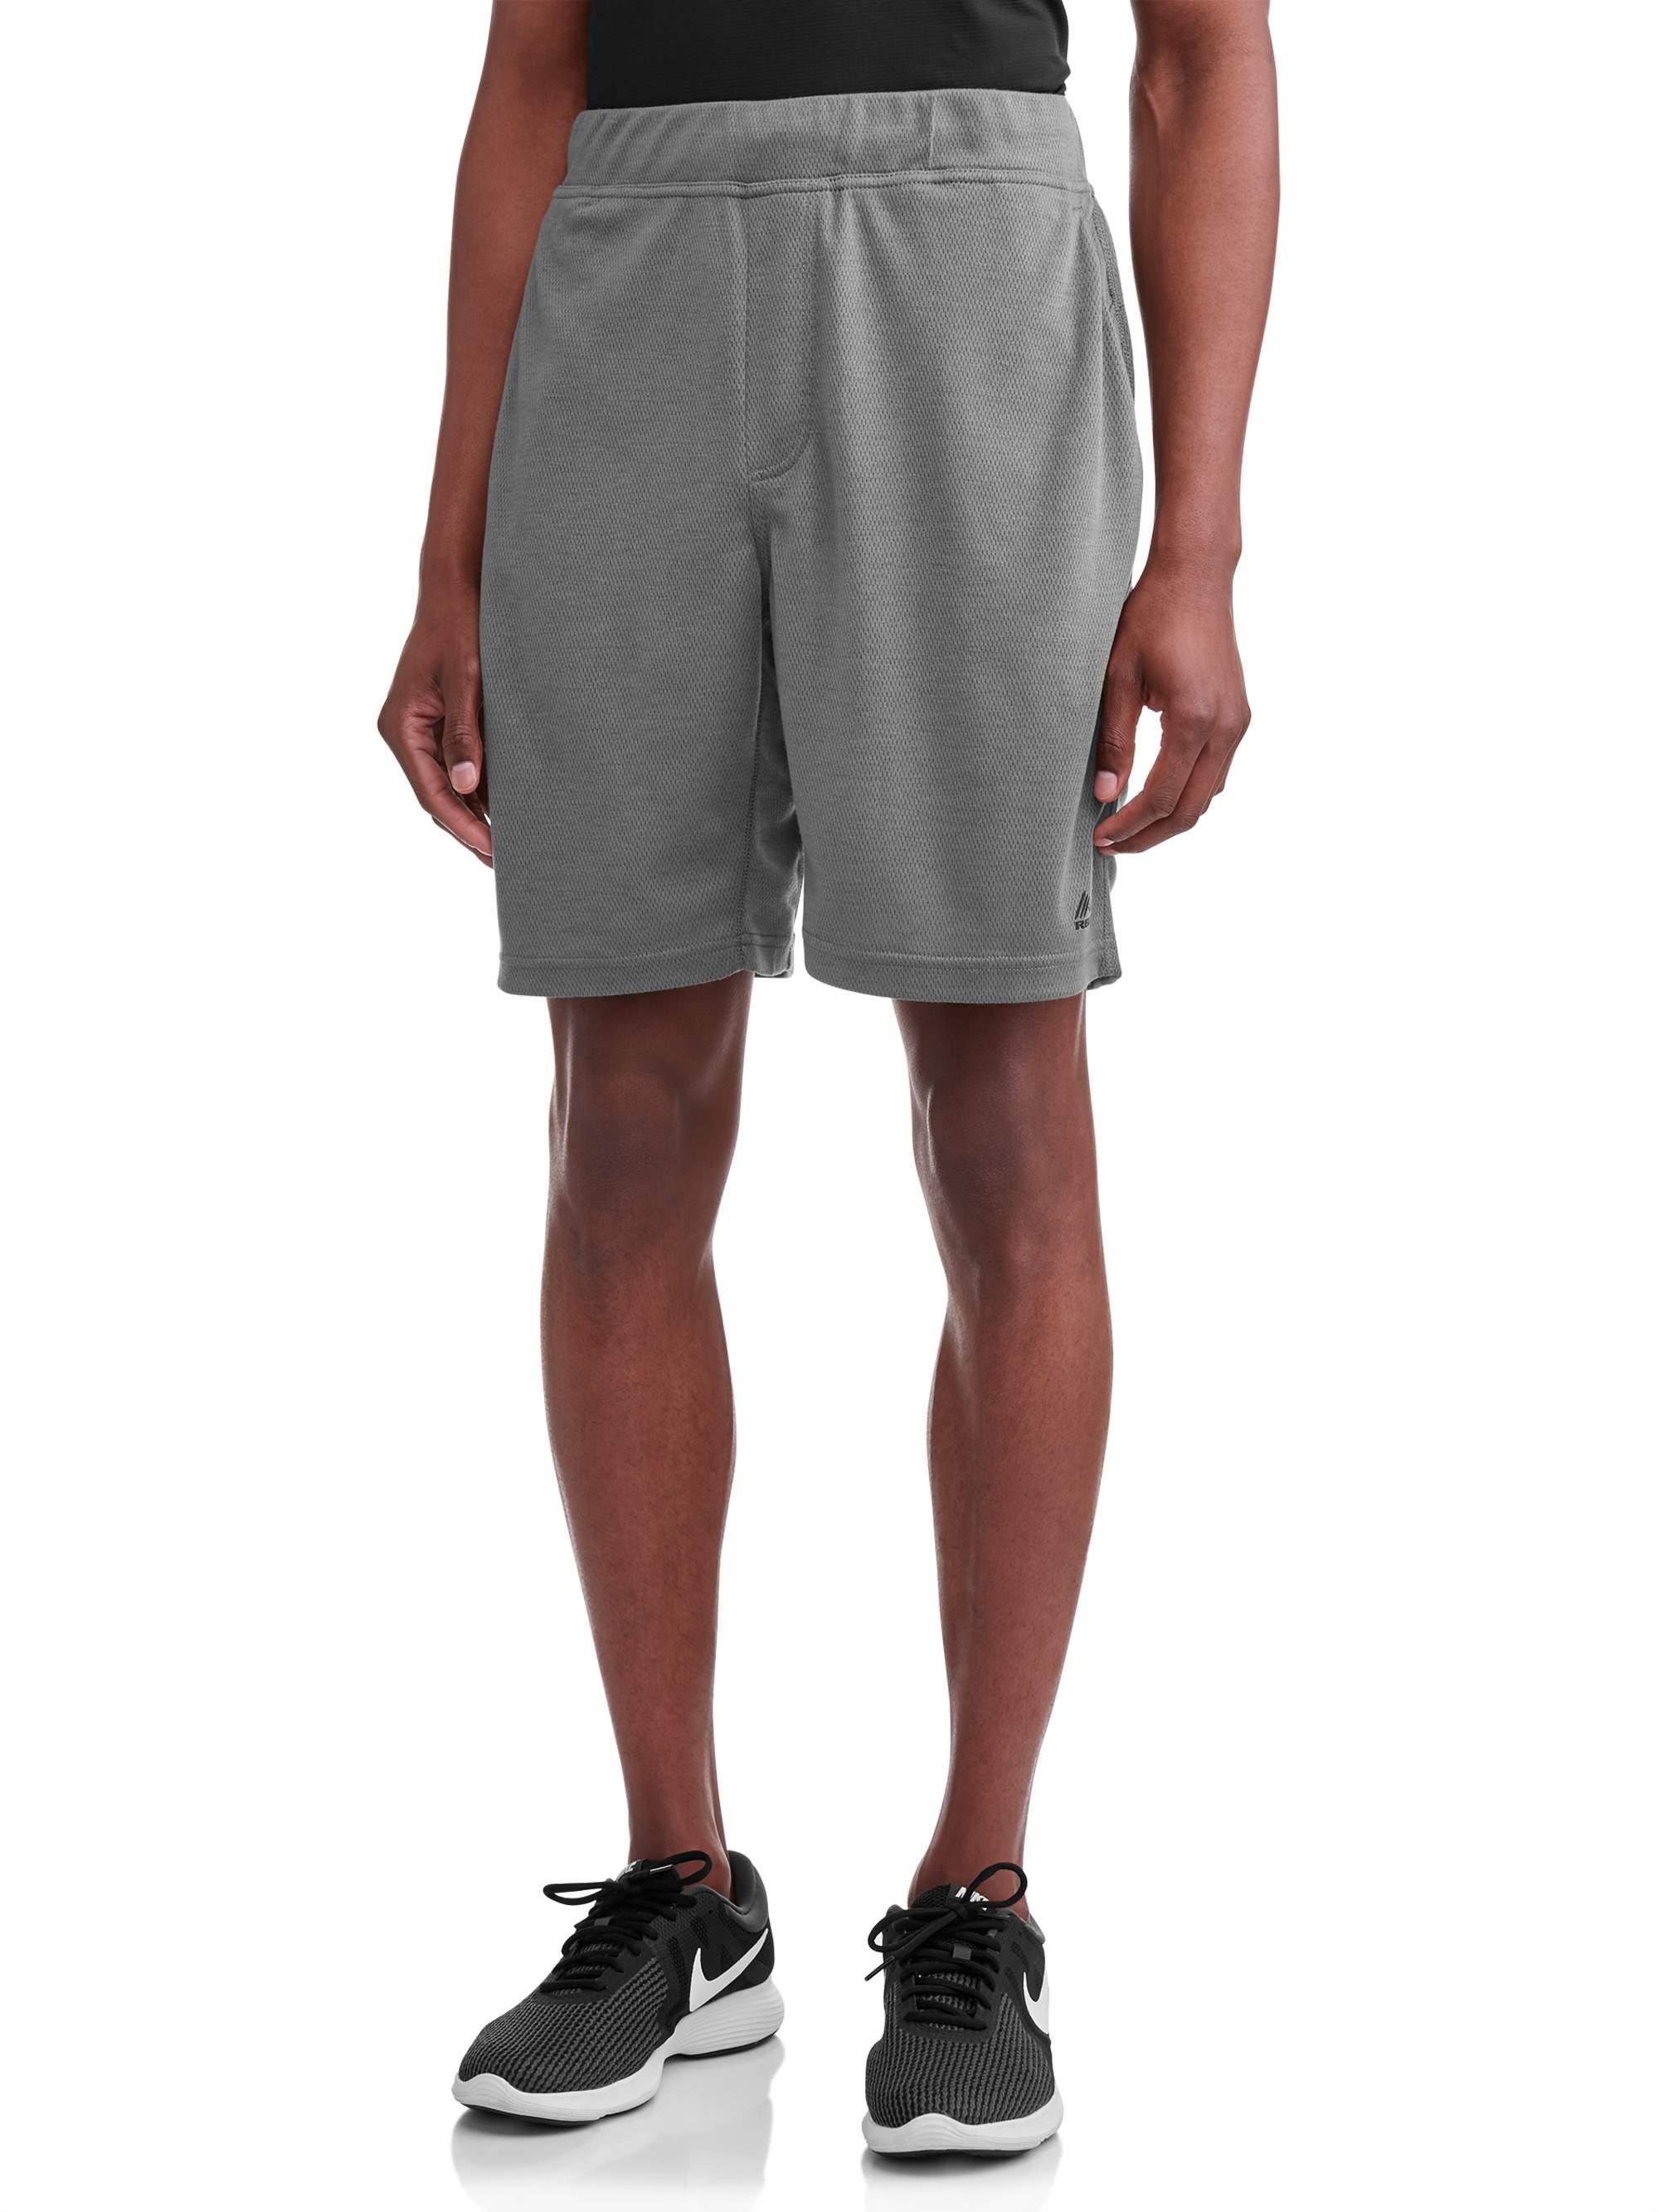 RBX Men's Novelty Leisure Shorts